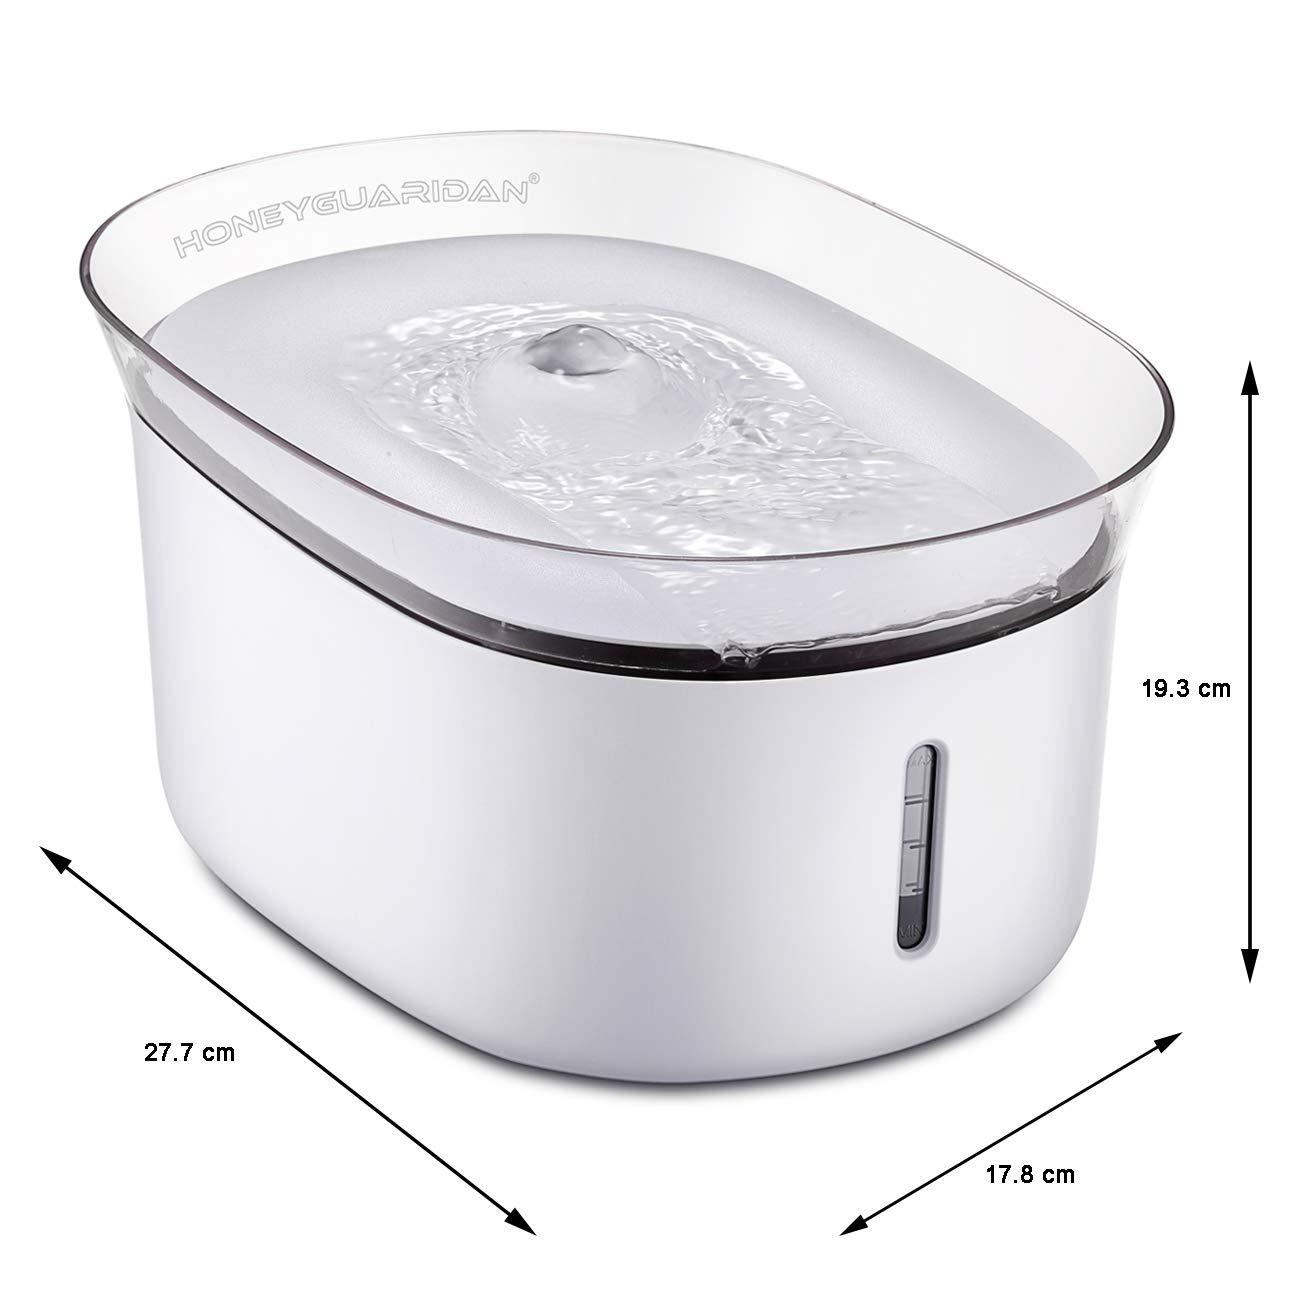 HoneyGuaridan W18 Fuente de Agua Automática para Mascotas, Bebederos Mascotas. 2